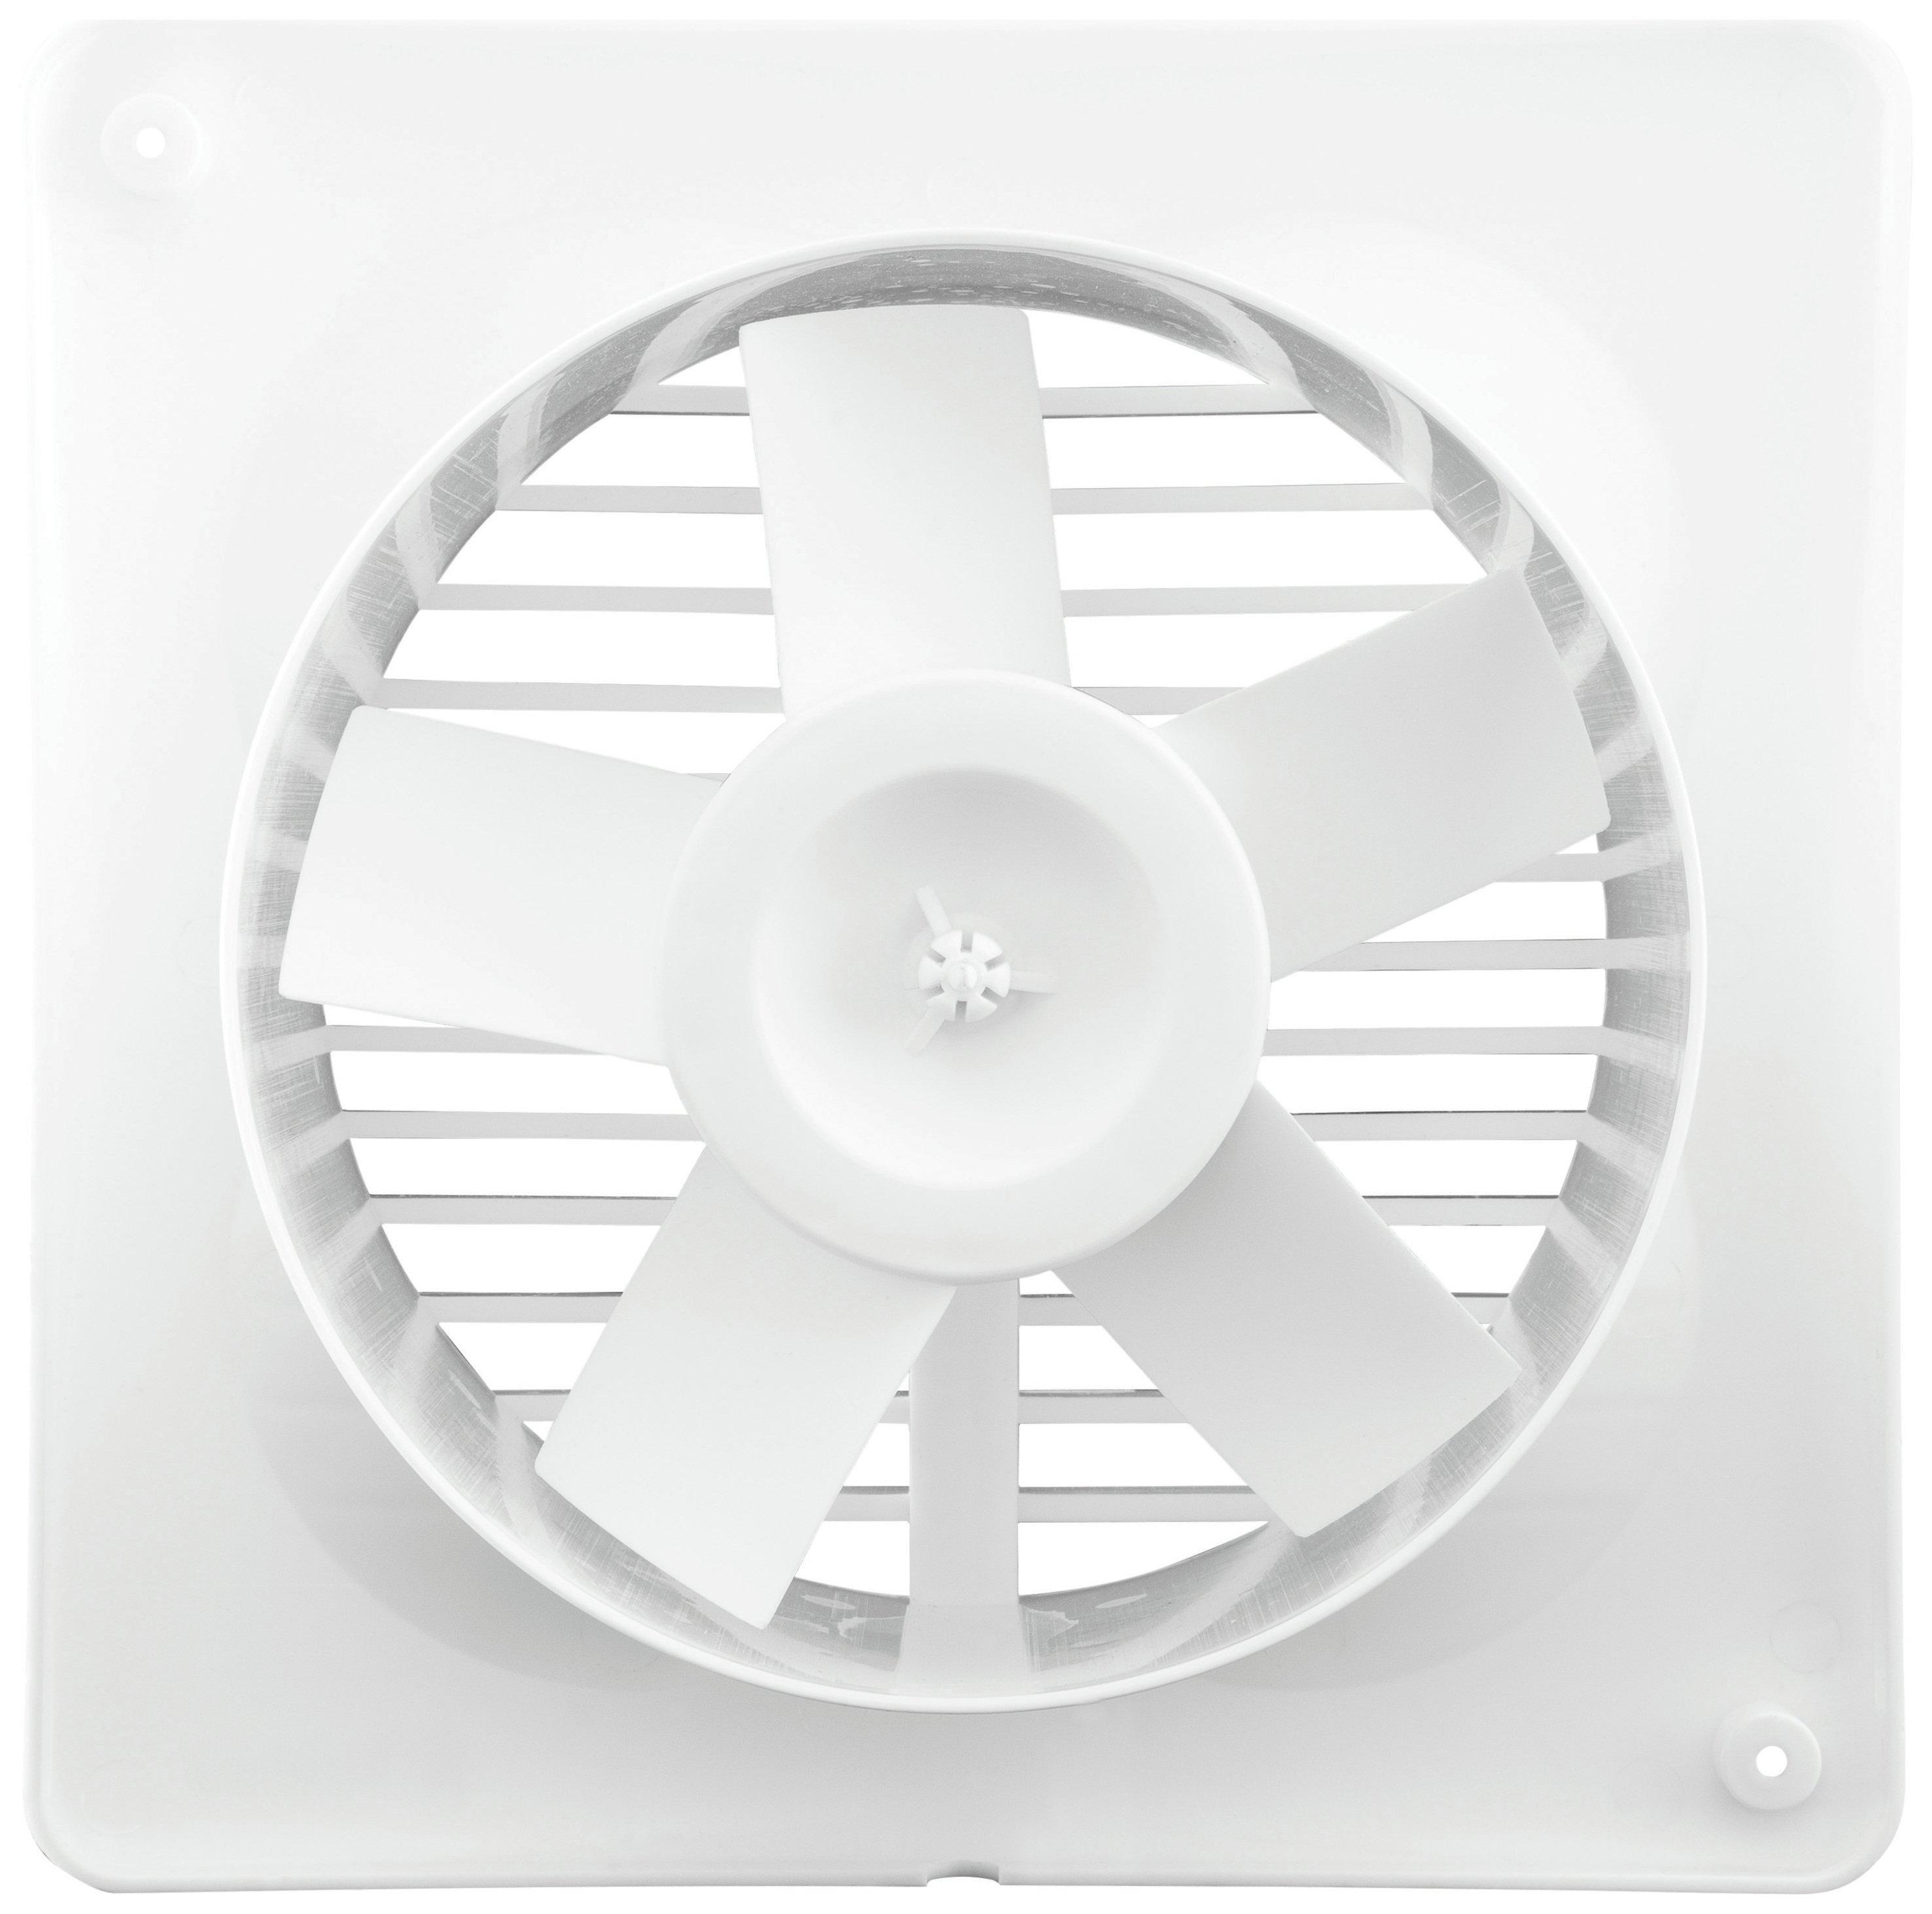 Xpelair Extractor Fans For Bathrooms: Xpelair VX100T Timer Bathroom Fan